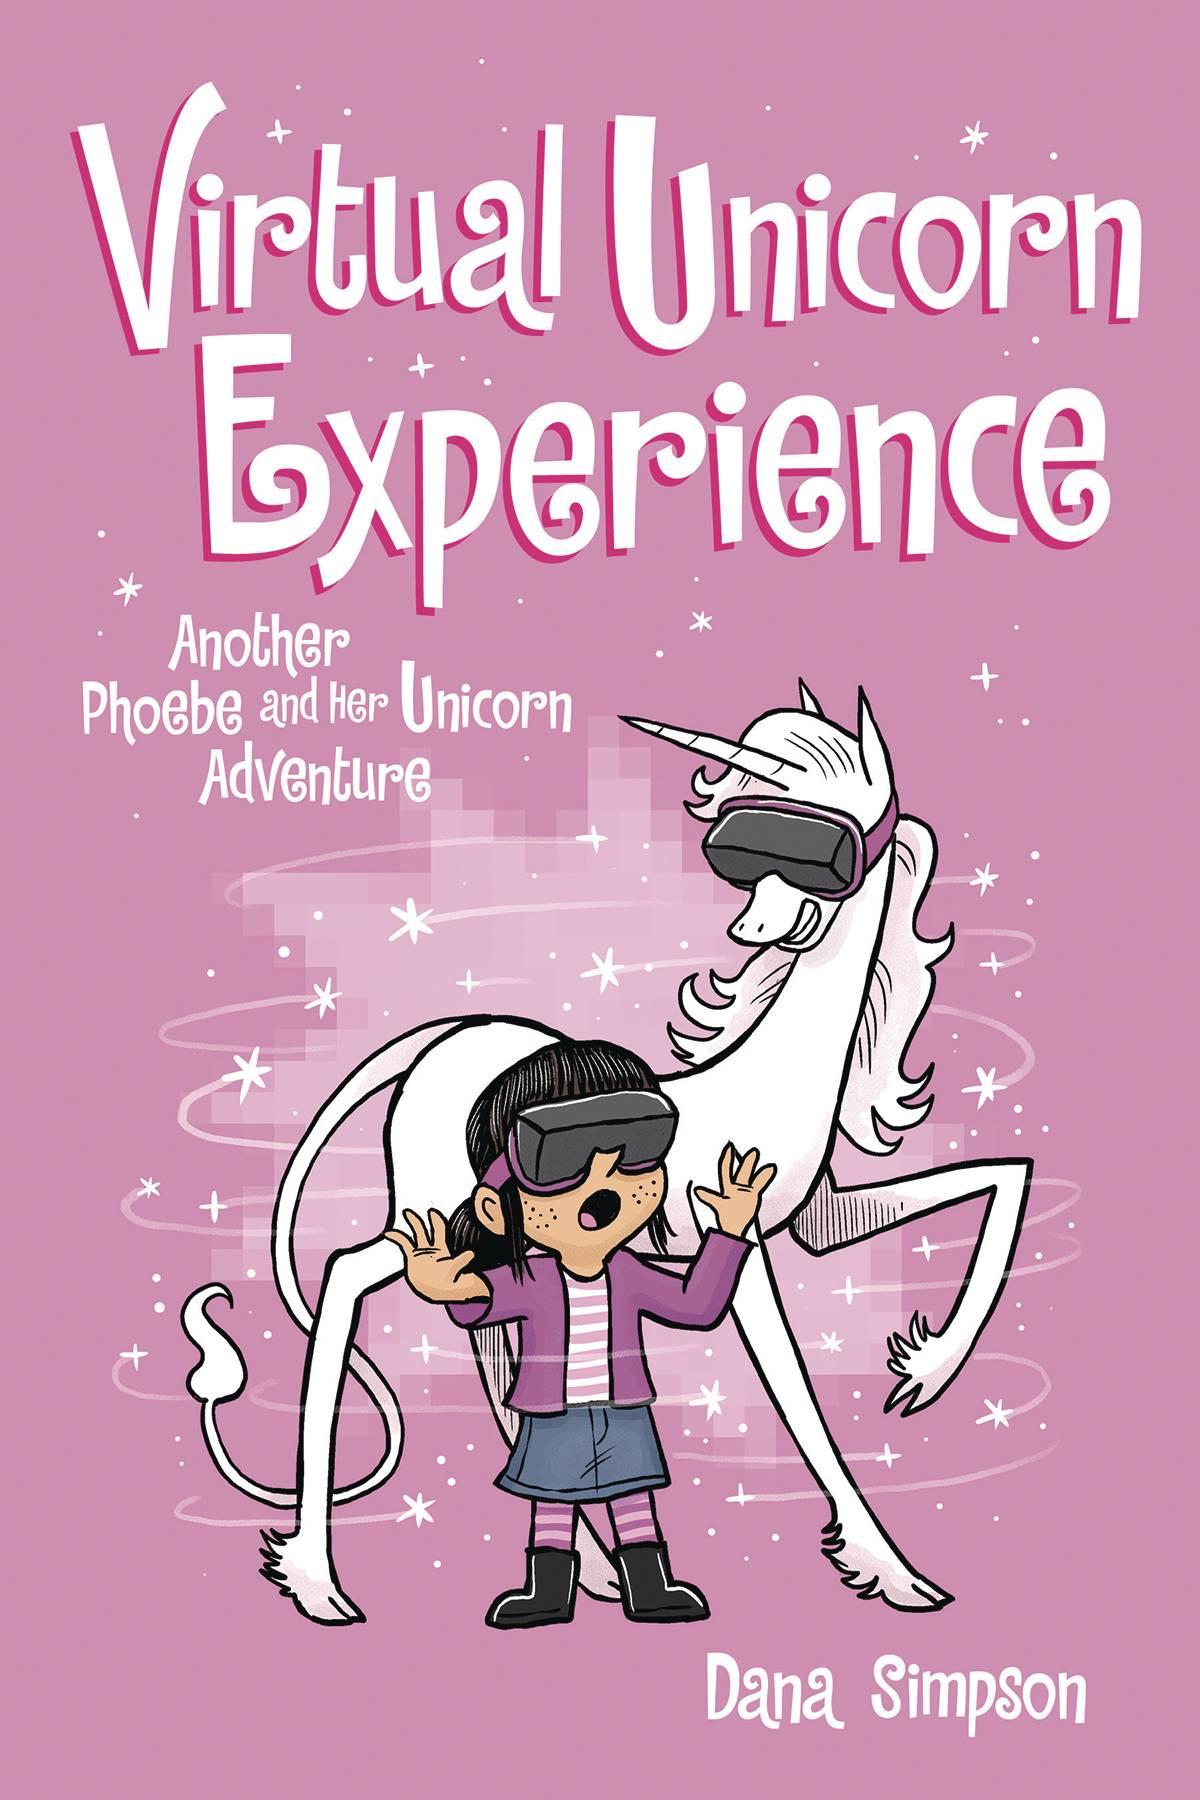 PHOEBE & HER UNICORN GN 12 VIRTUAL UNICORN EXPERIENCE